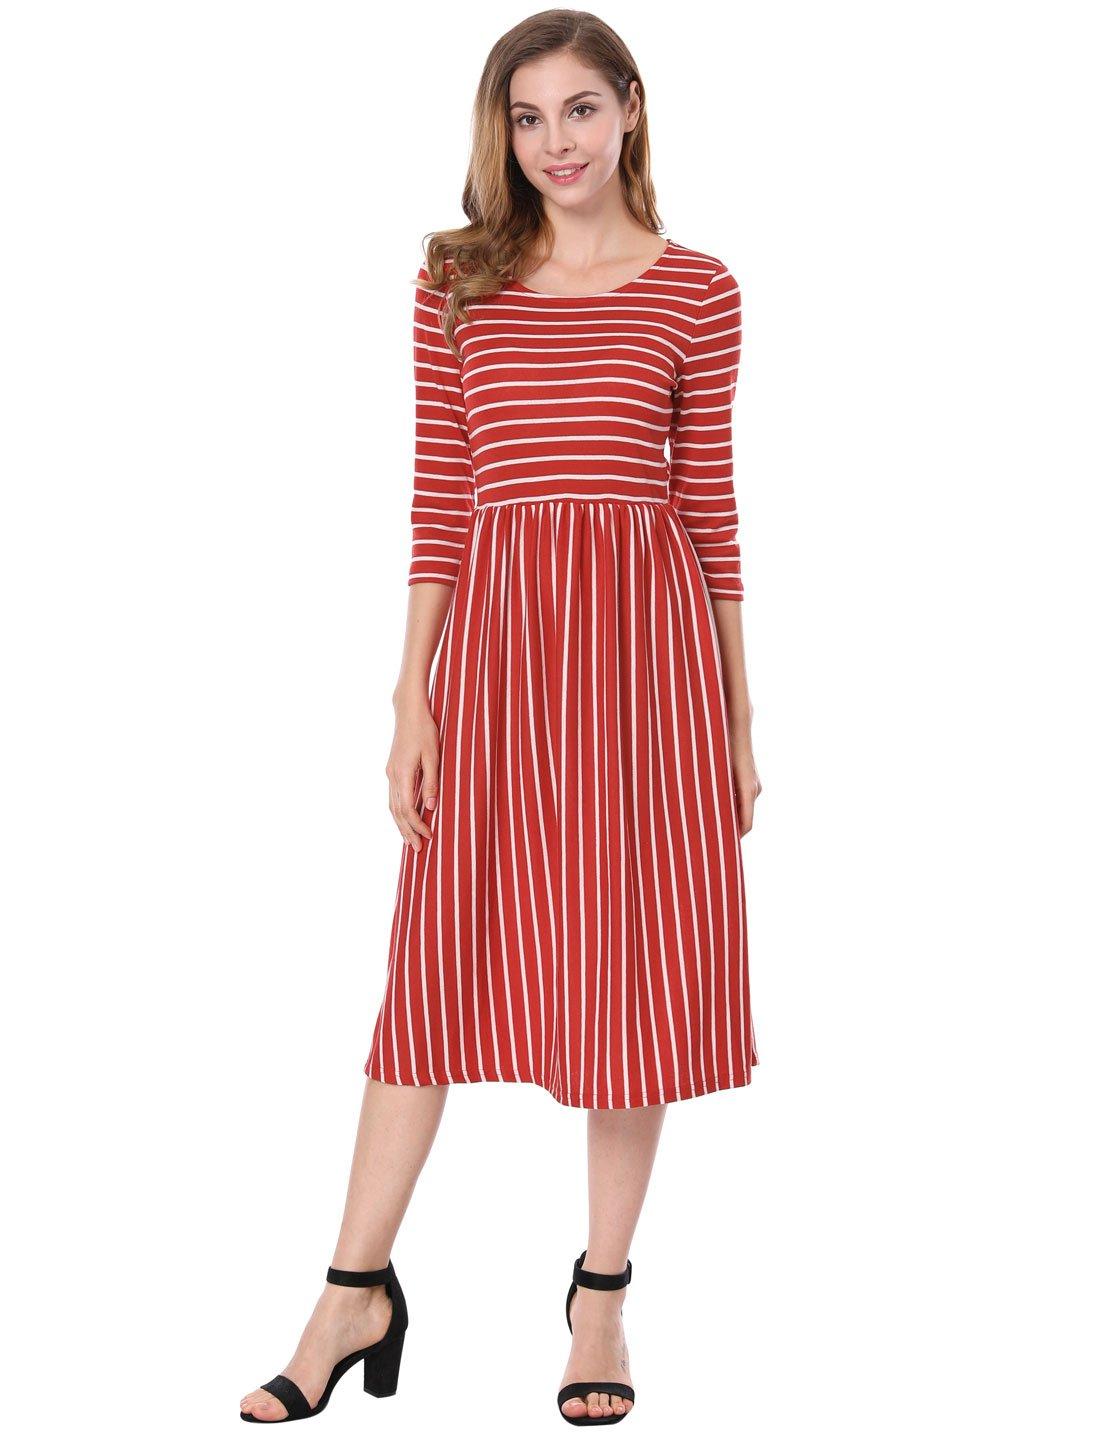 Allegra K Women's Contrast Striped 3/4 Sleeves Paneled Midi Flared Dress s18040800it0496